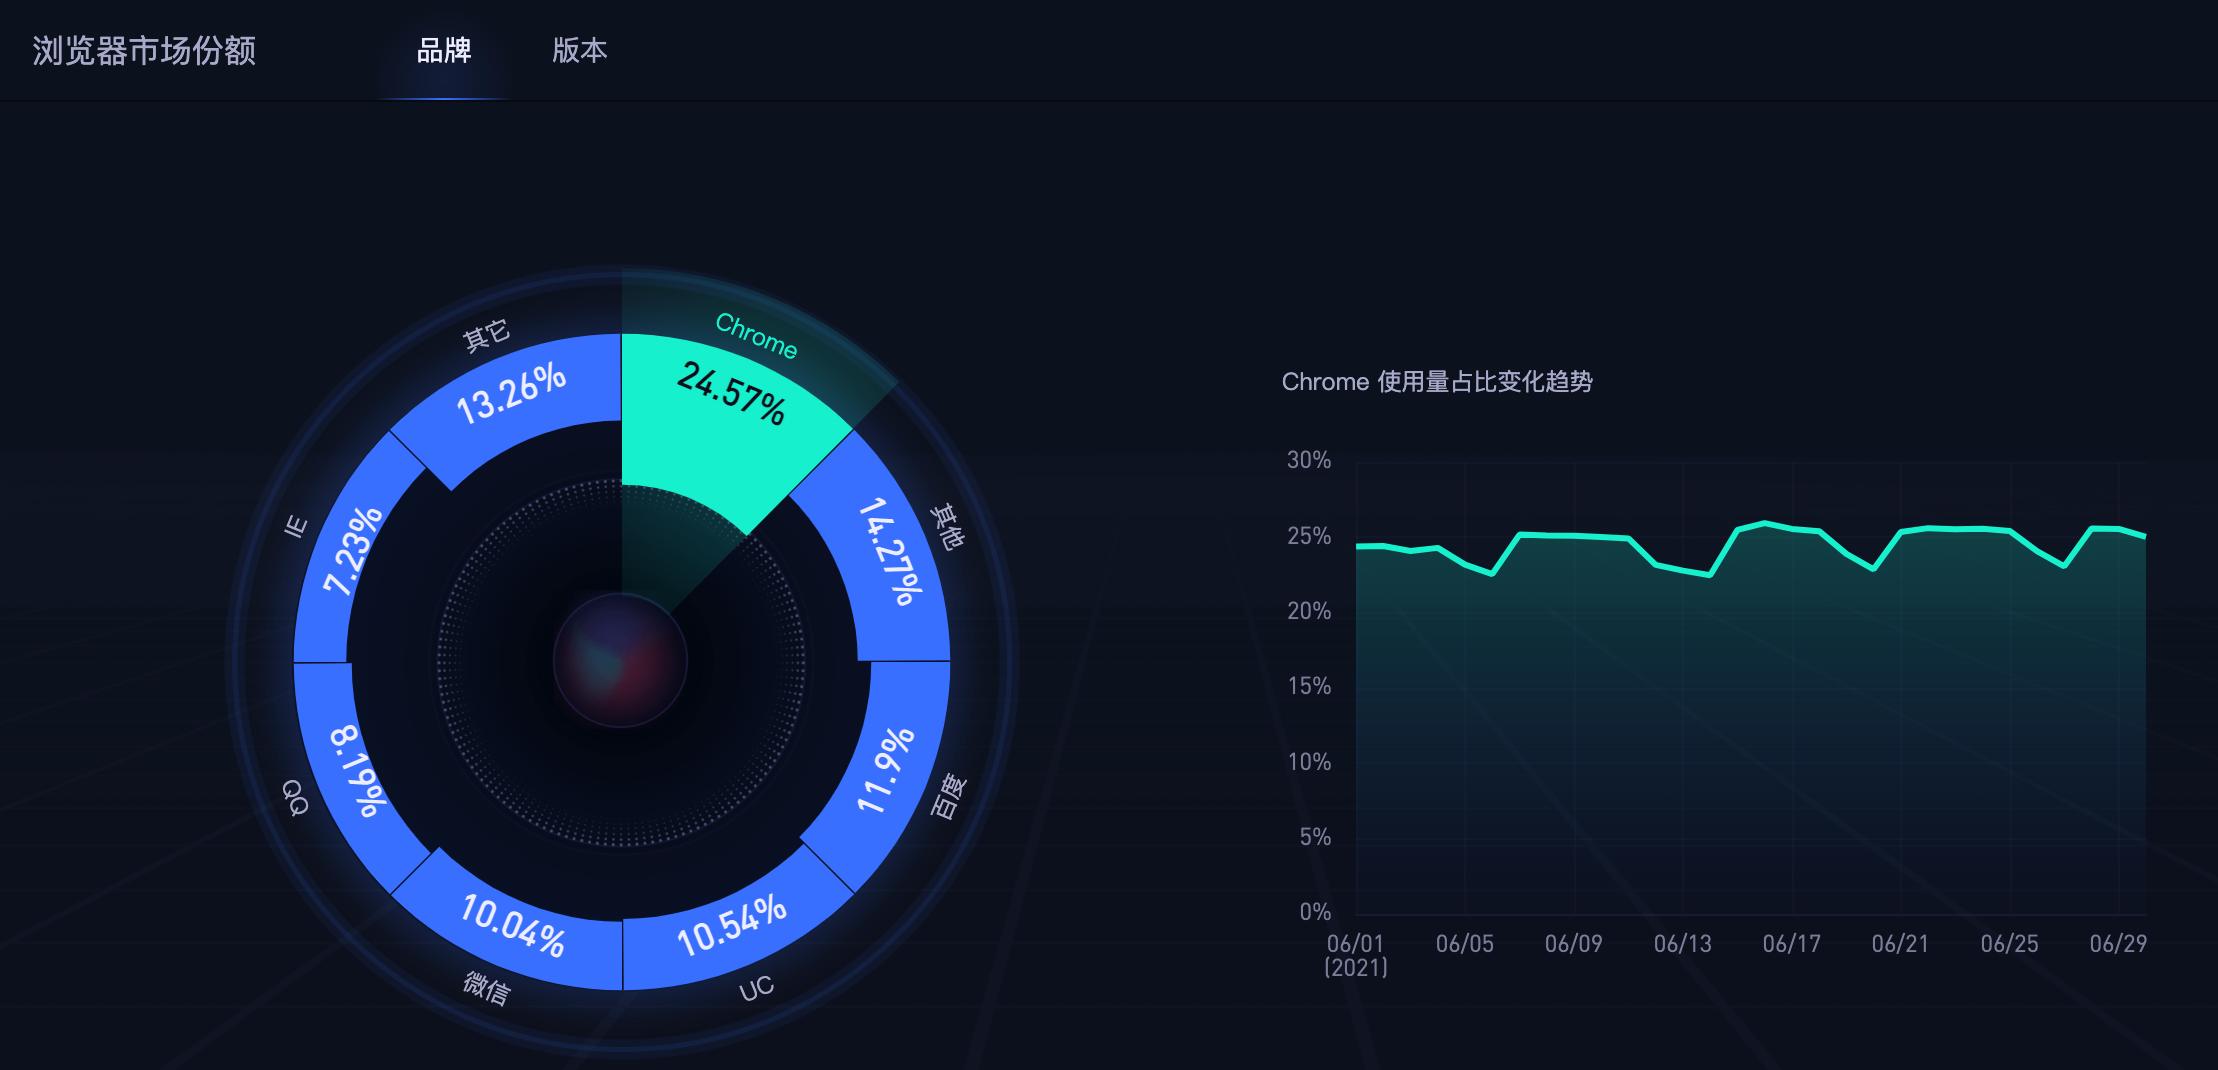 Web_Browser_Market_Share_CHN